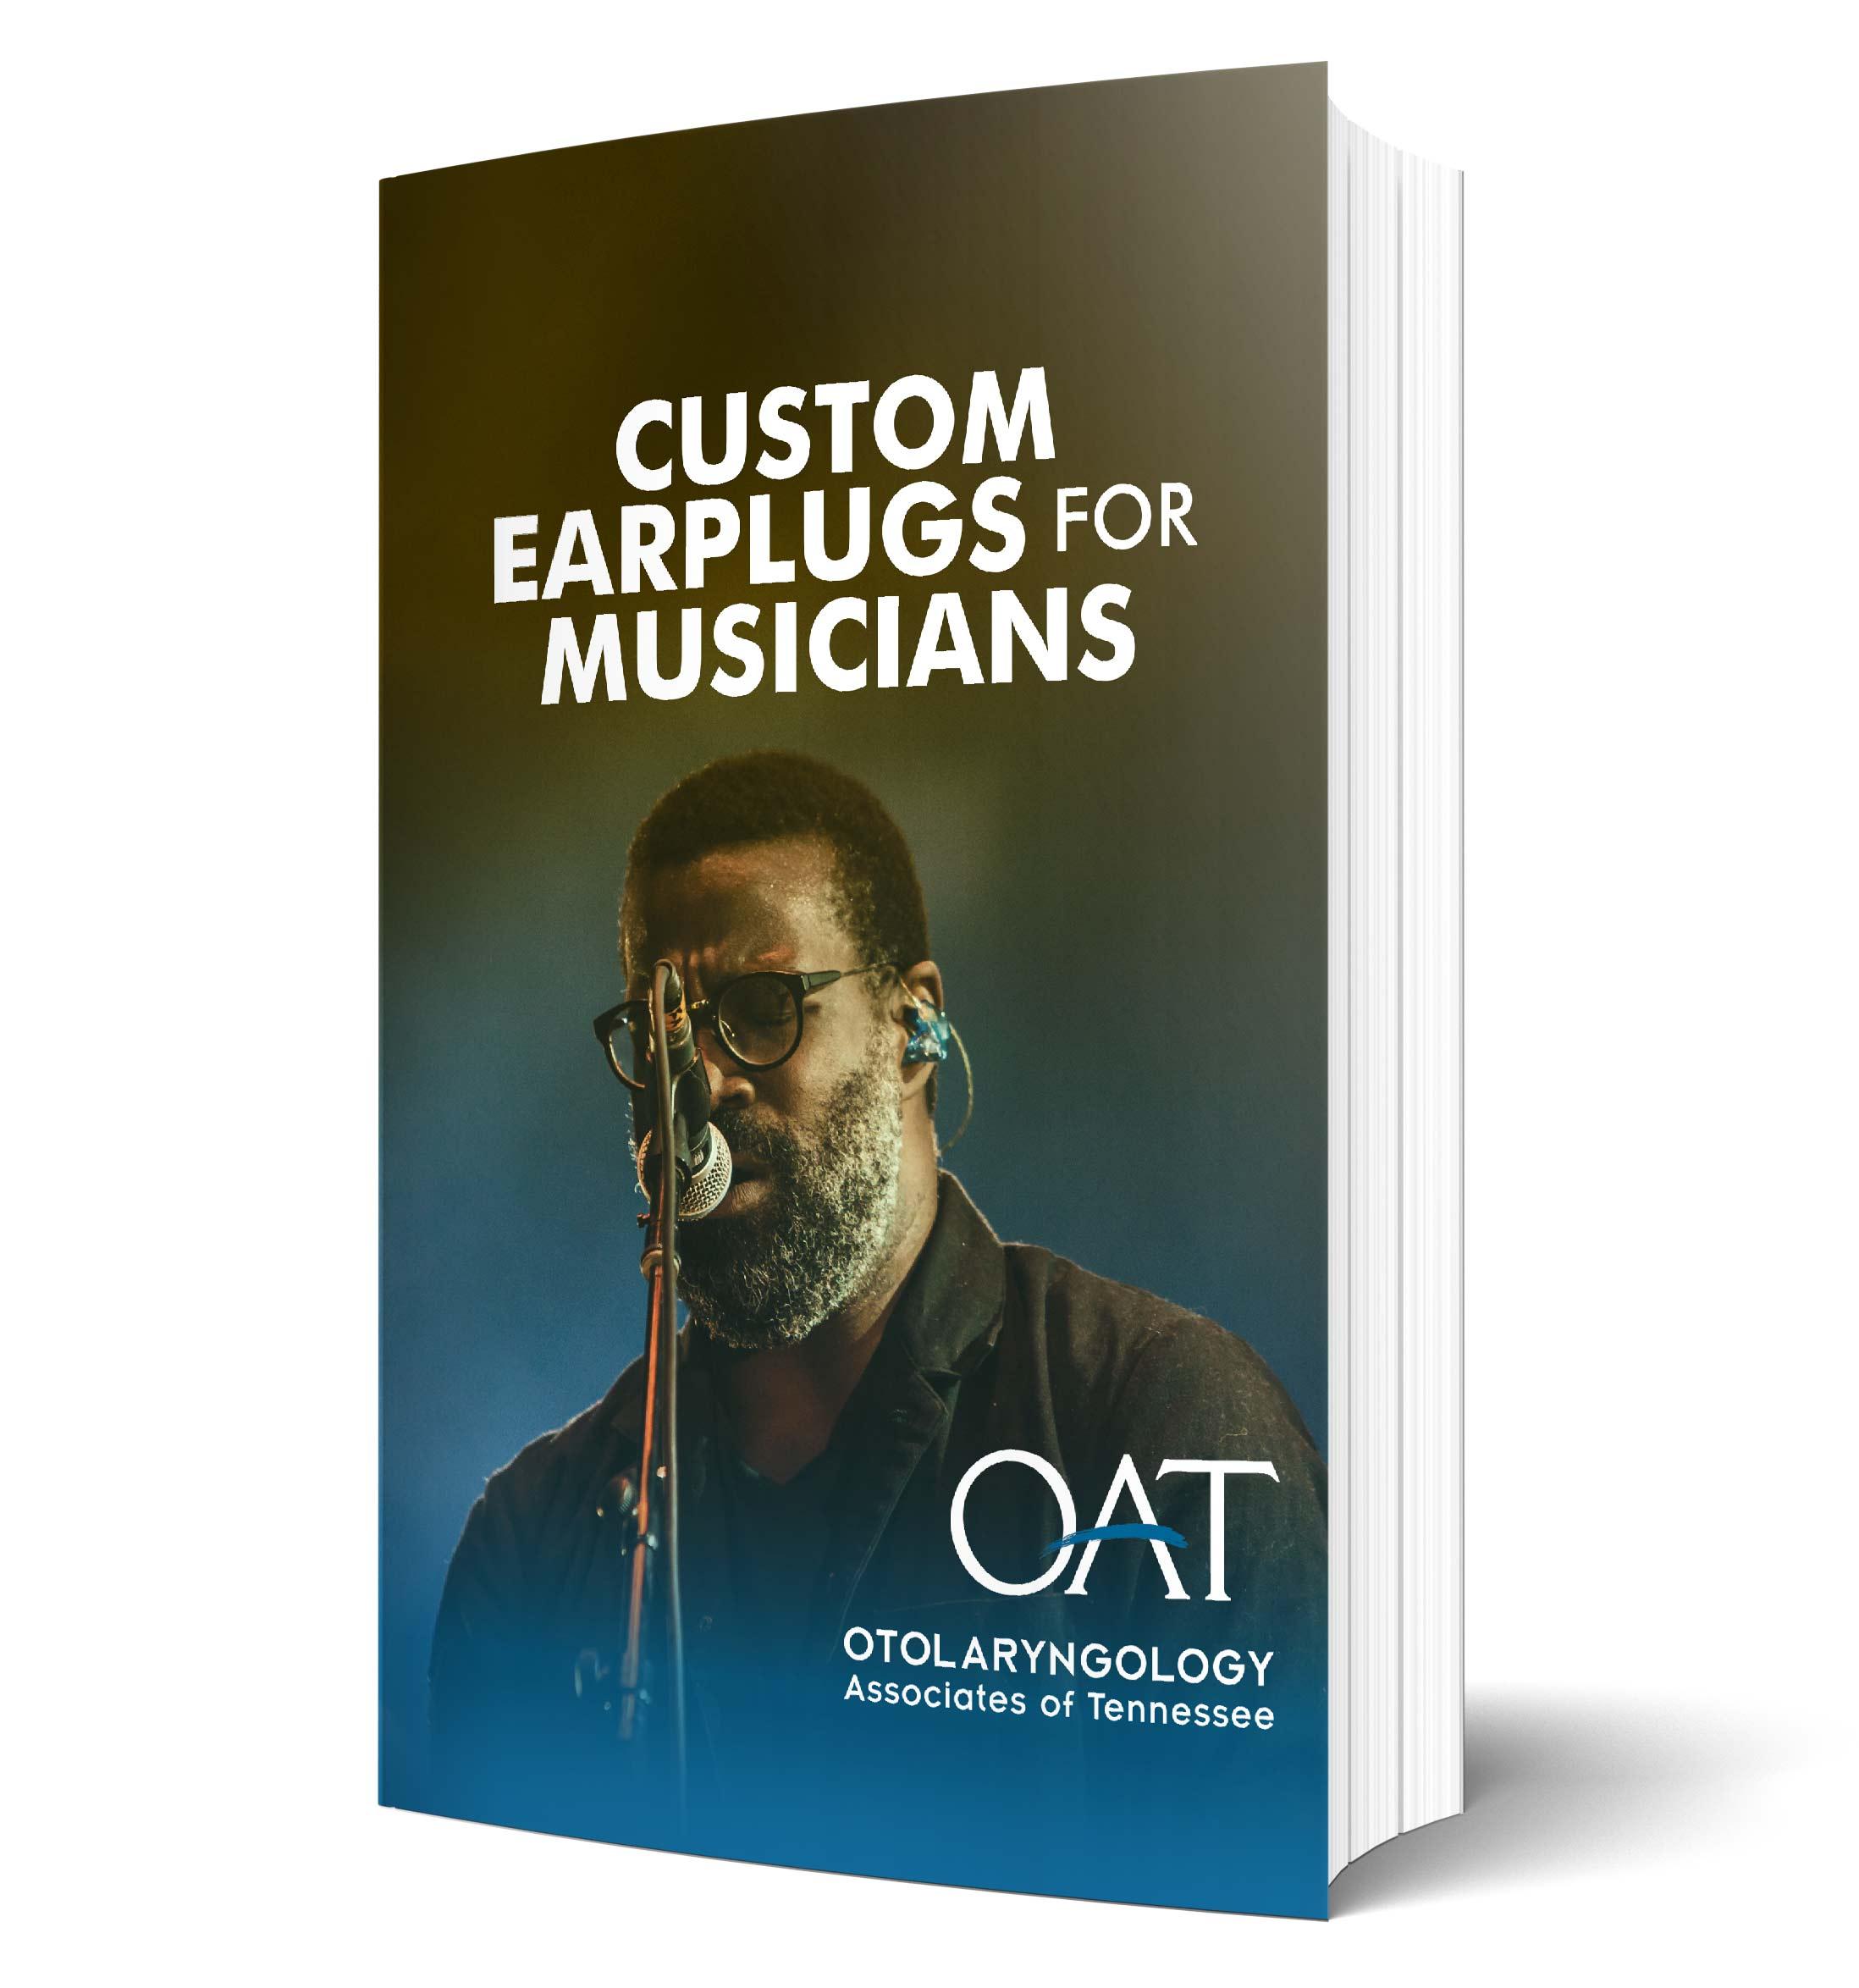 Custom-Earplugs-for-Musicians---eBook-Cover.png